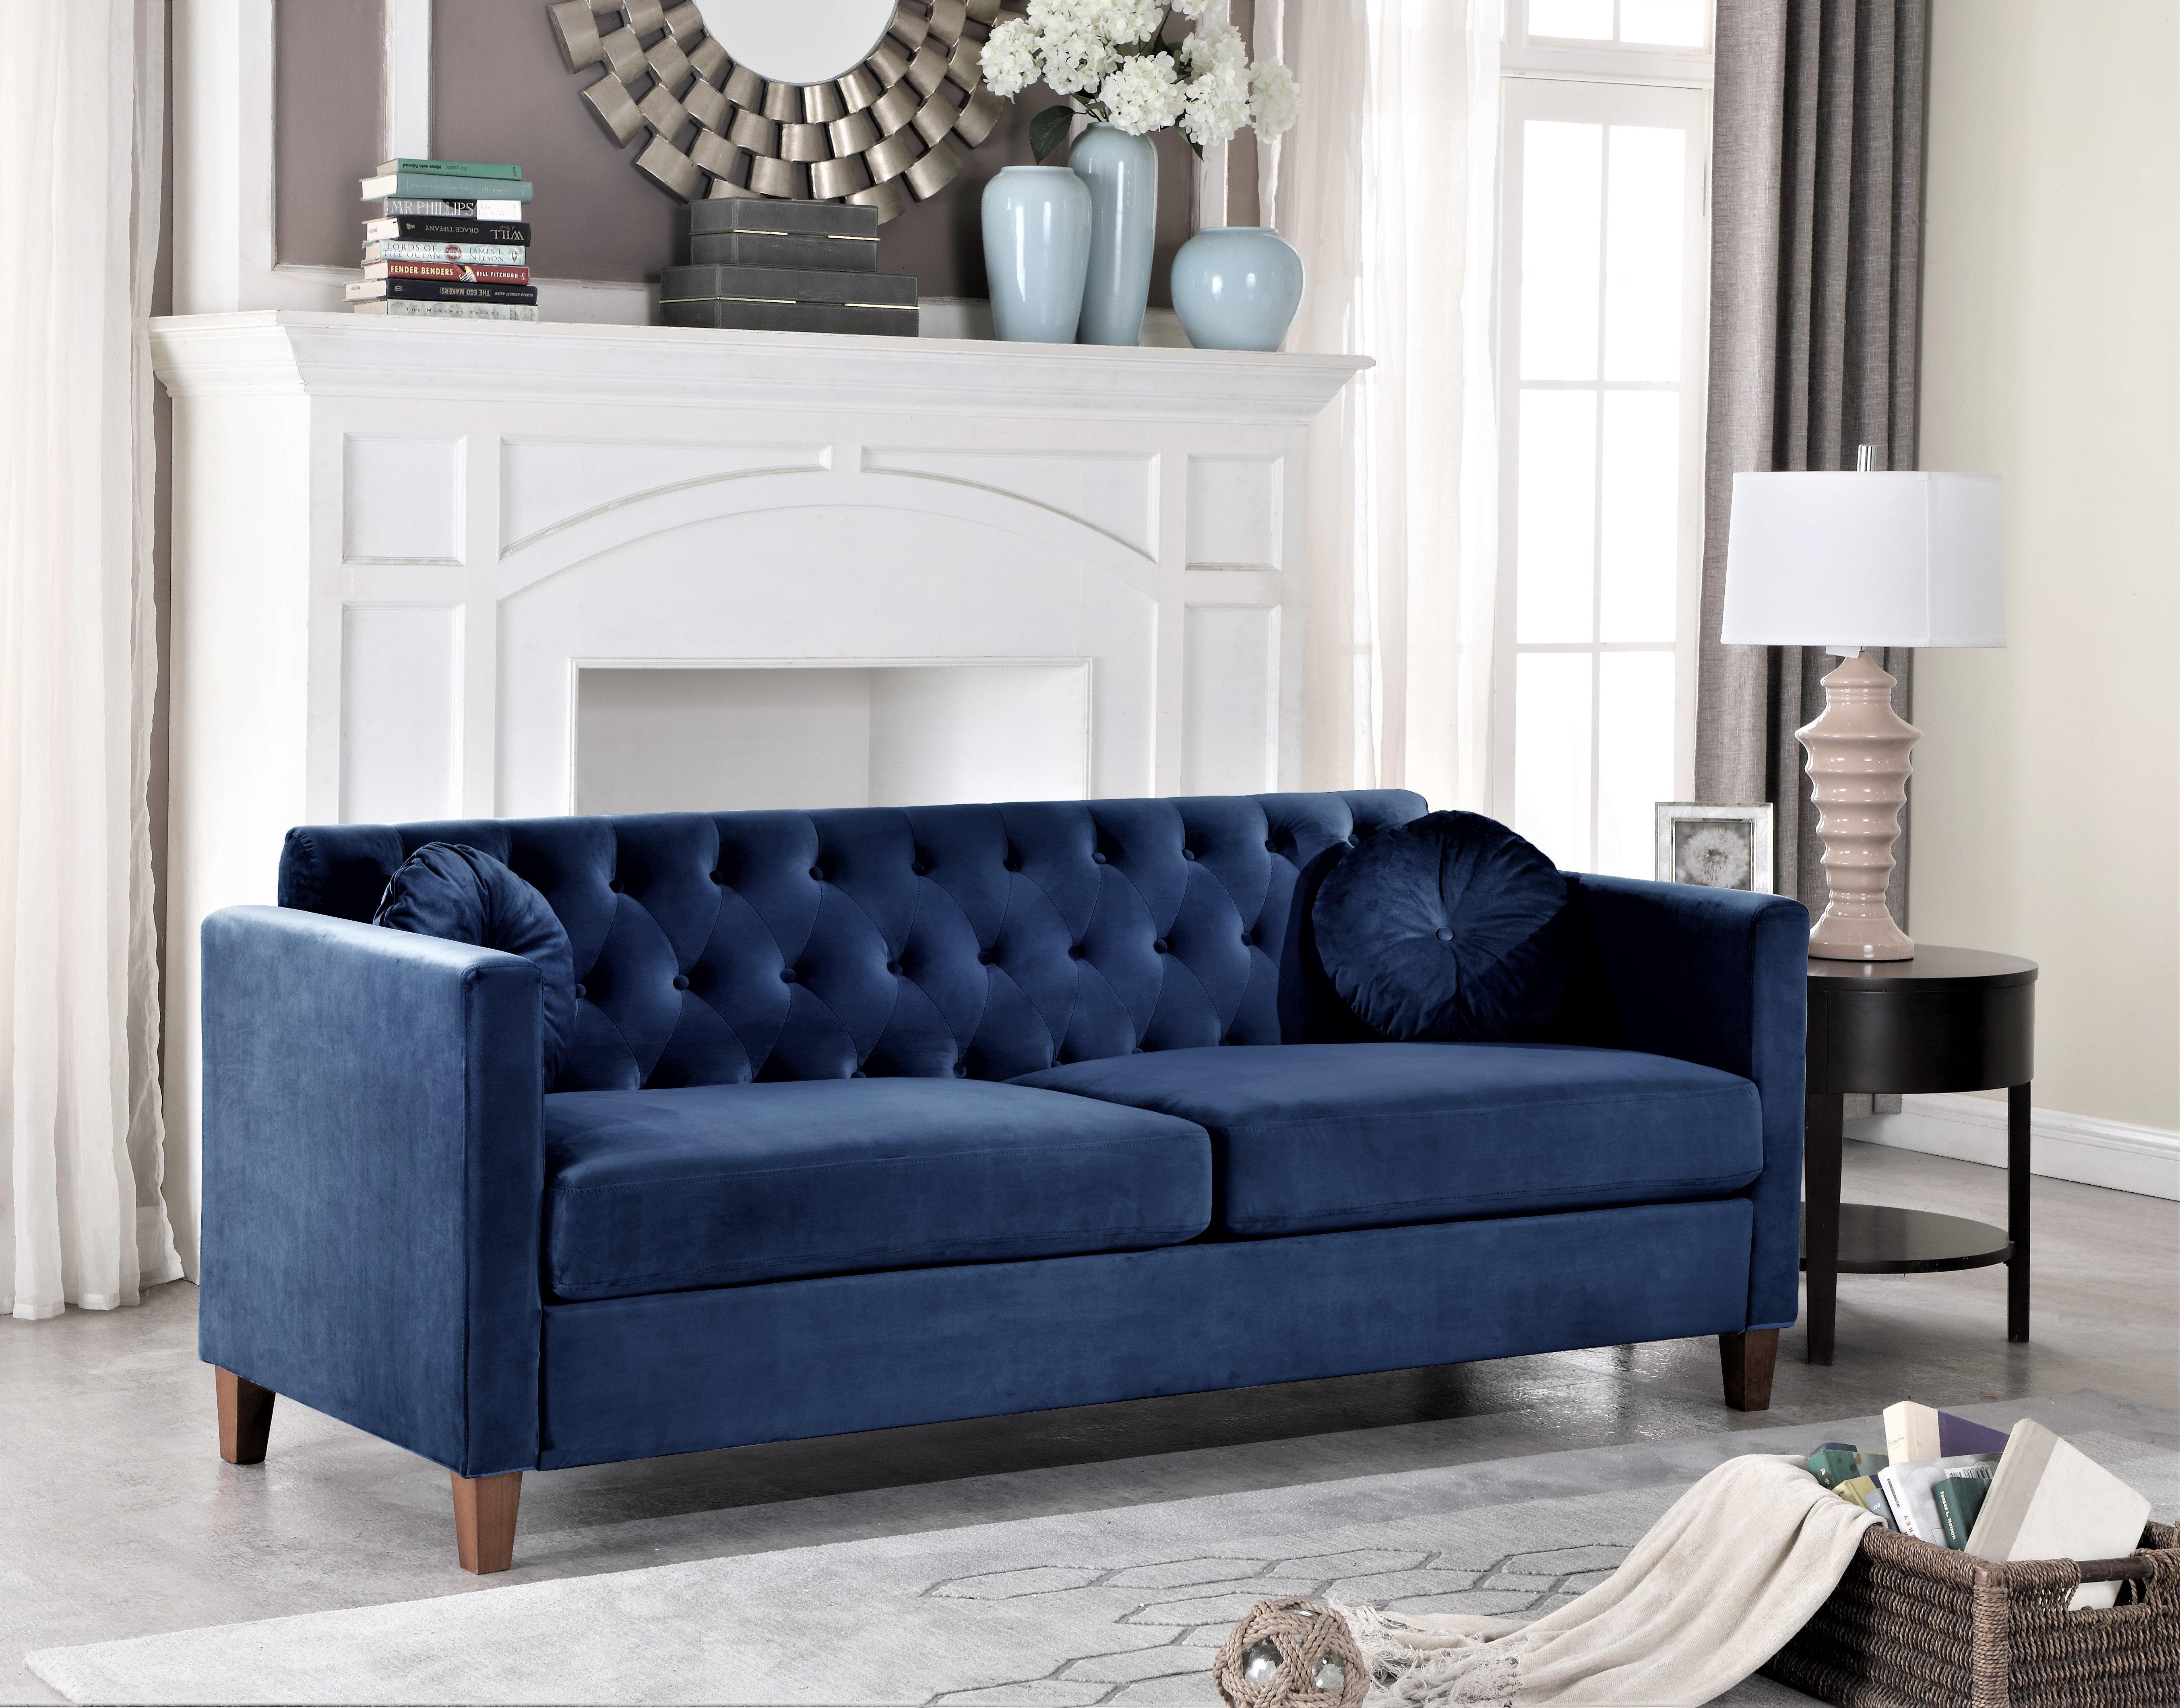 Mercer41 Persaud Velvet 79 5 Square Arms Sofa Reviews Wayfair Ca